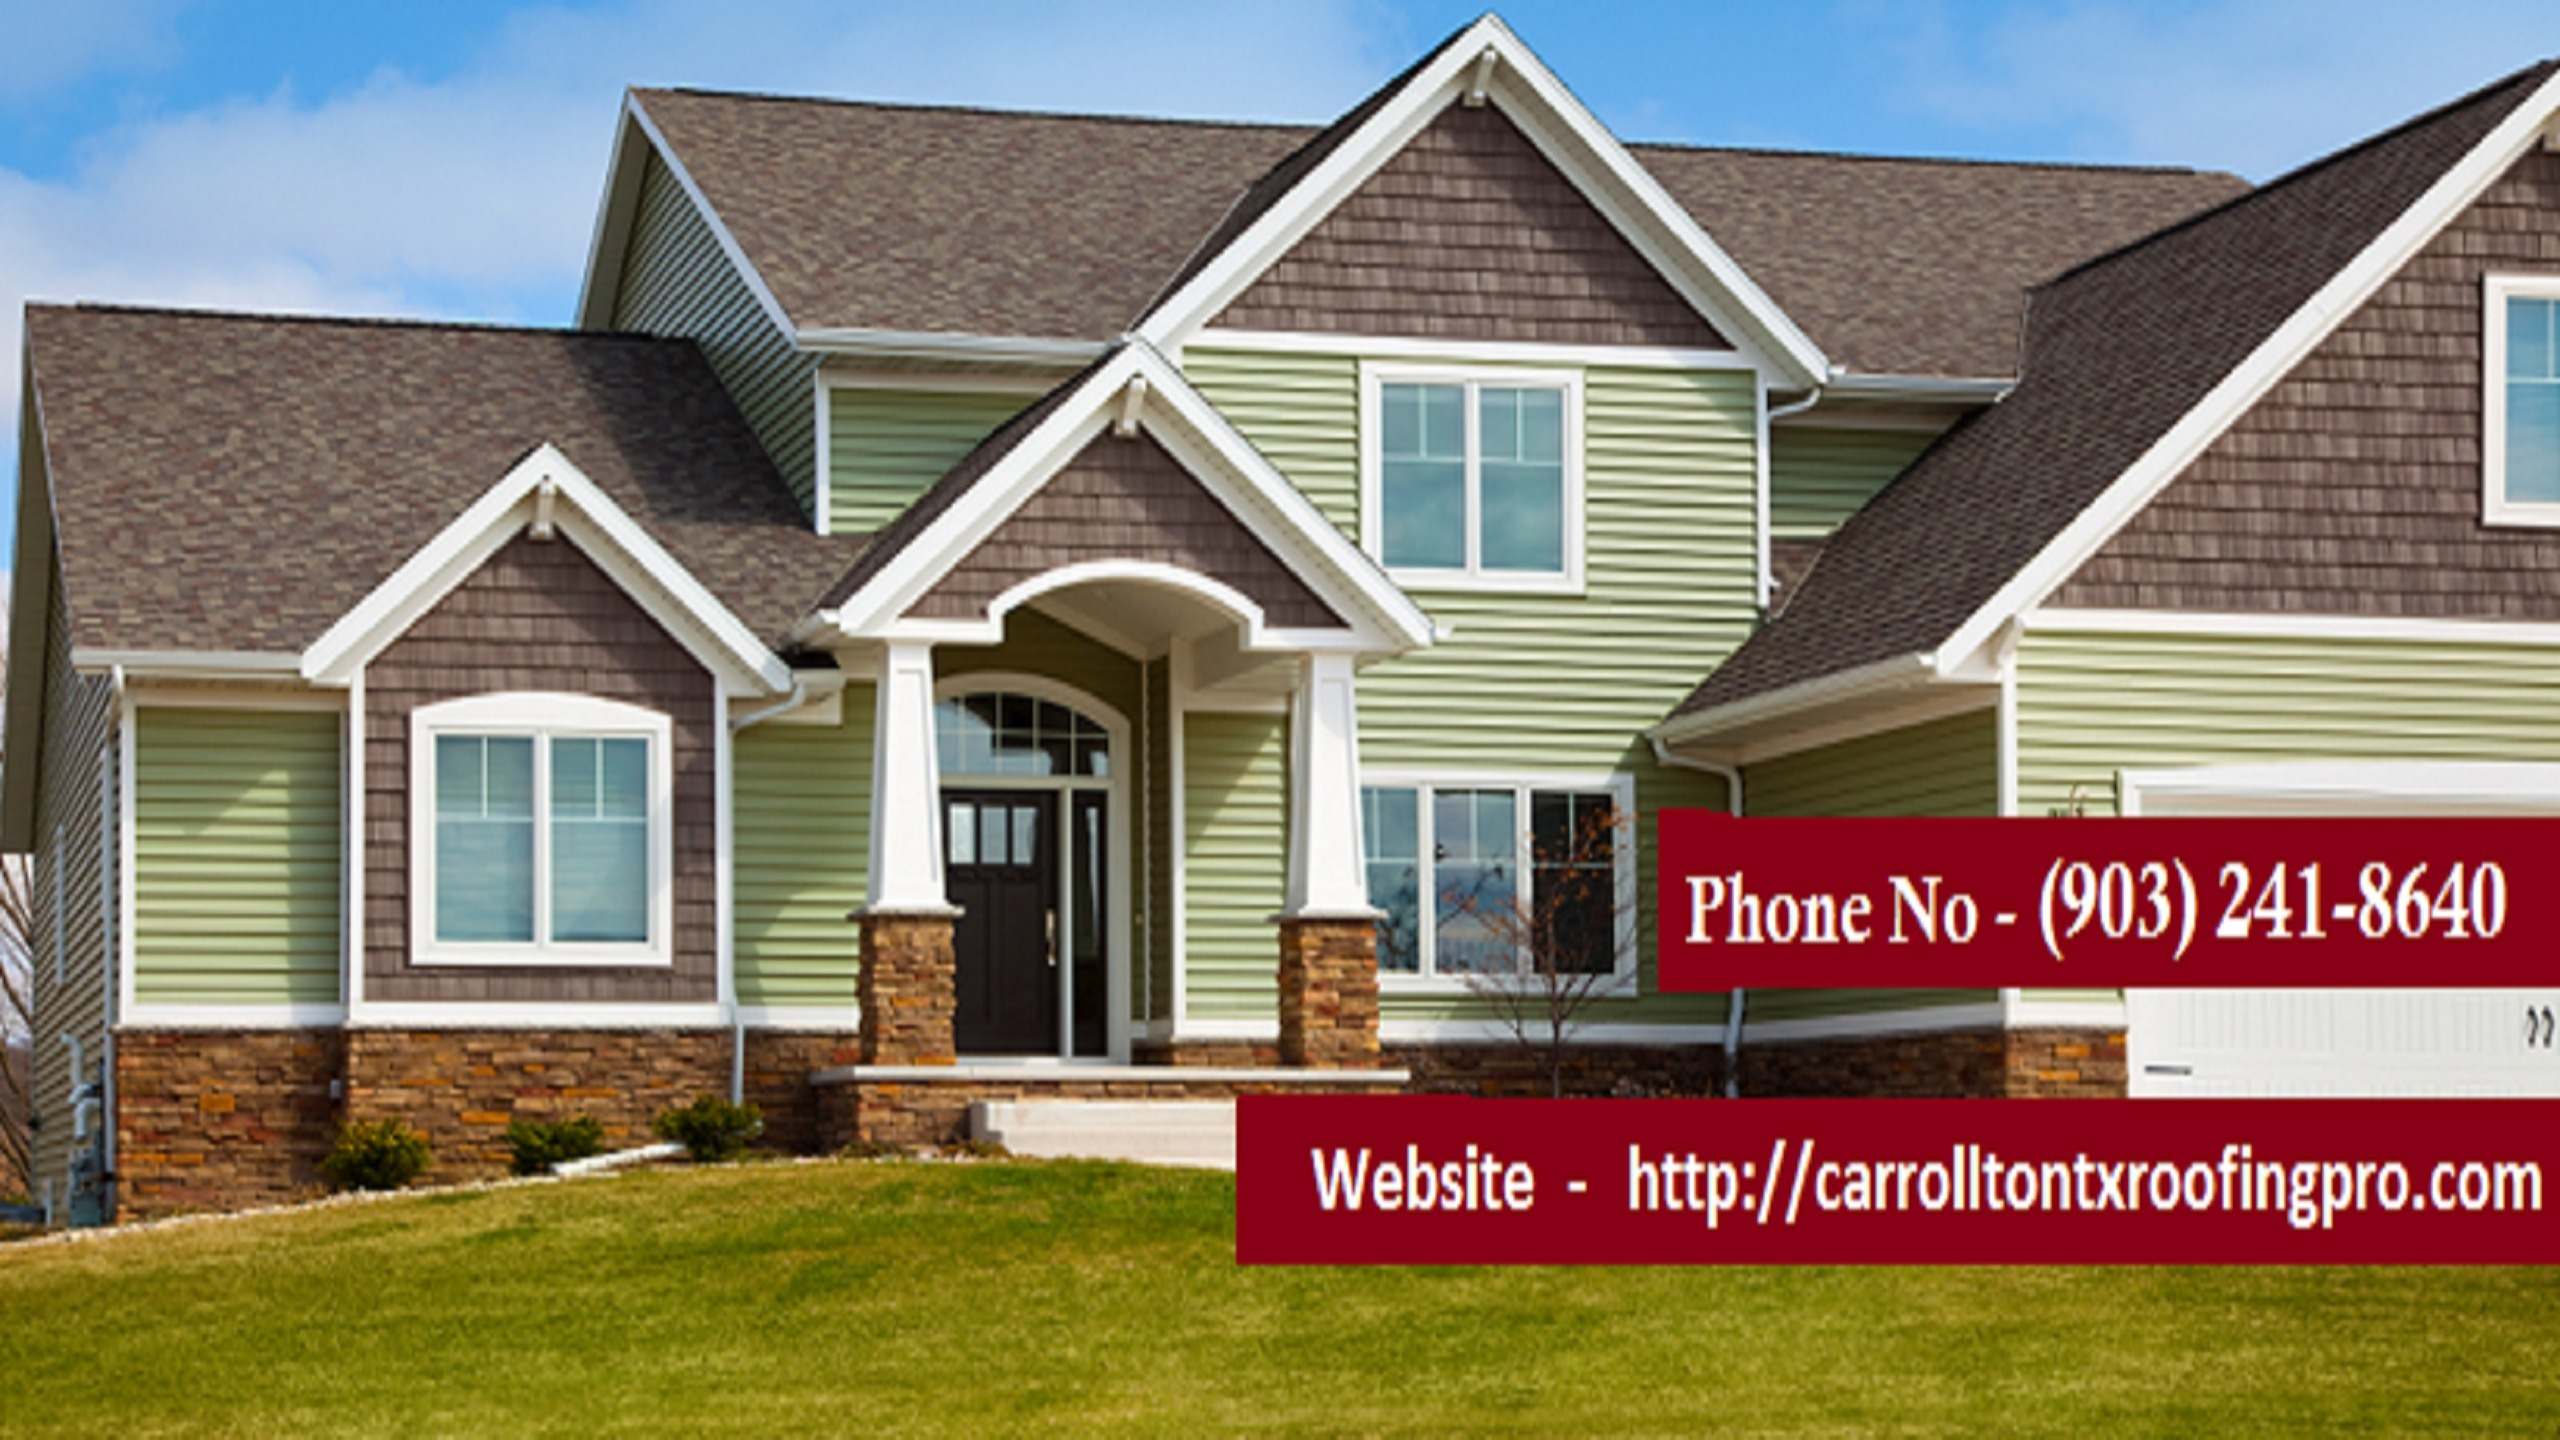 Carrollton Tx Roofing Pro (@carrolltontxroofingpro) Cover Image